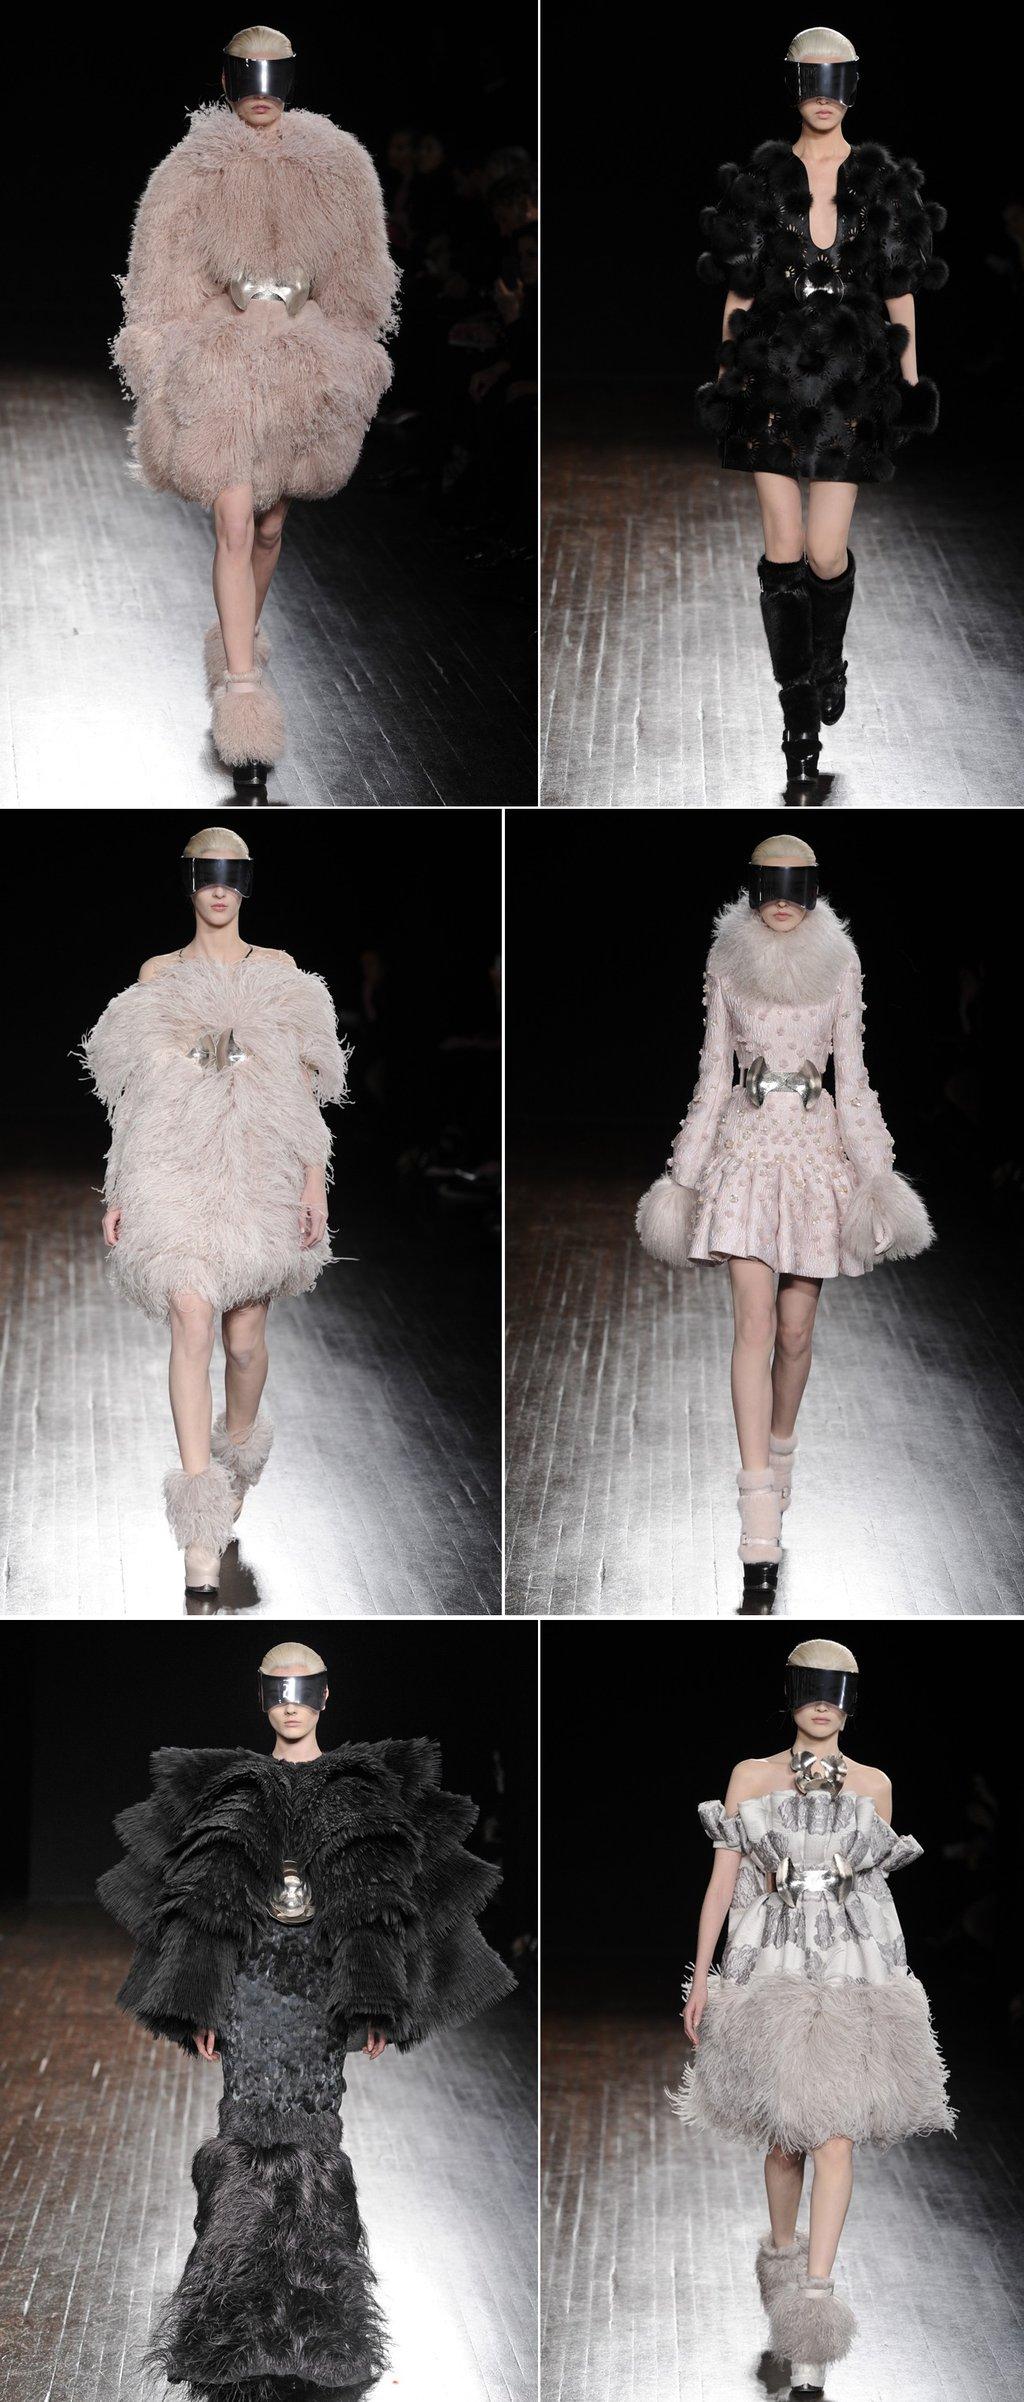 Haute-couture-wedding-inspiration-lots-of-texture-2012-sarah-burton-for-alexander-mcqueen.full